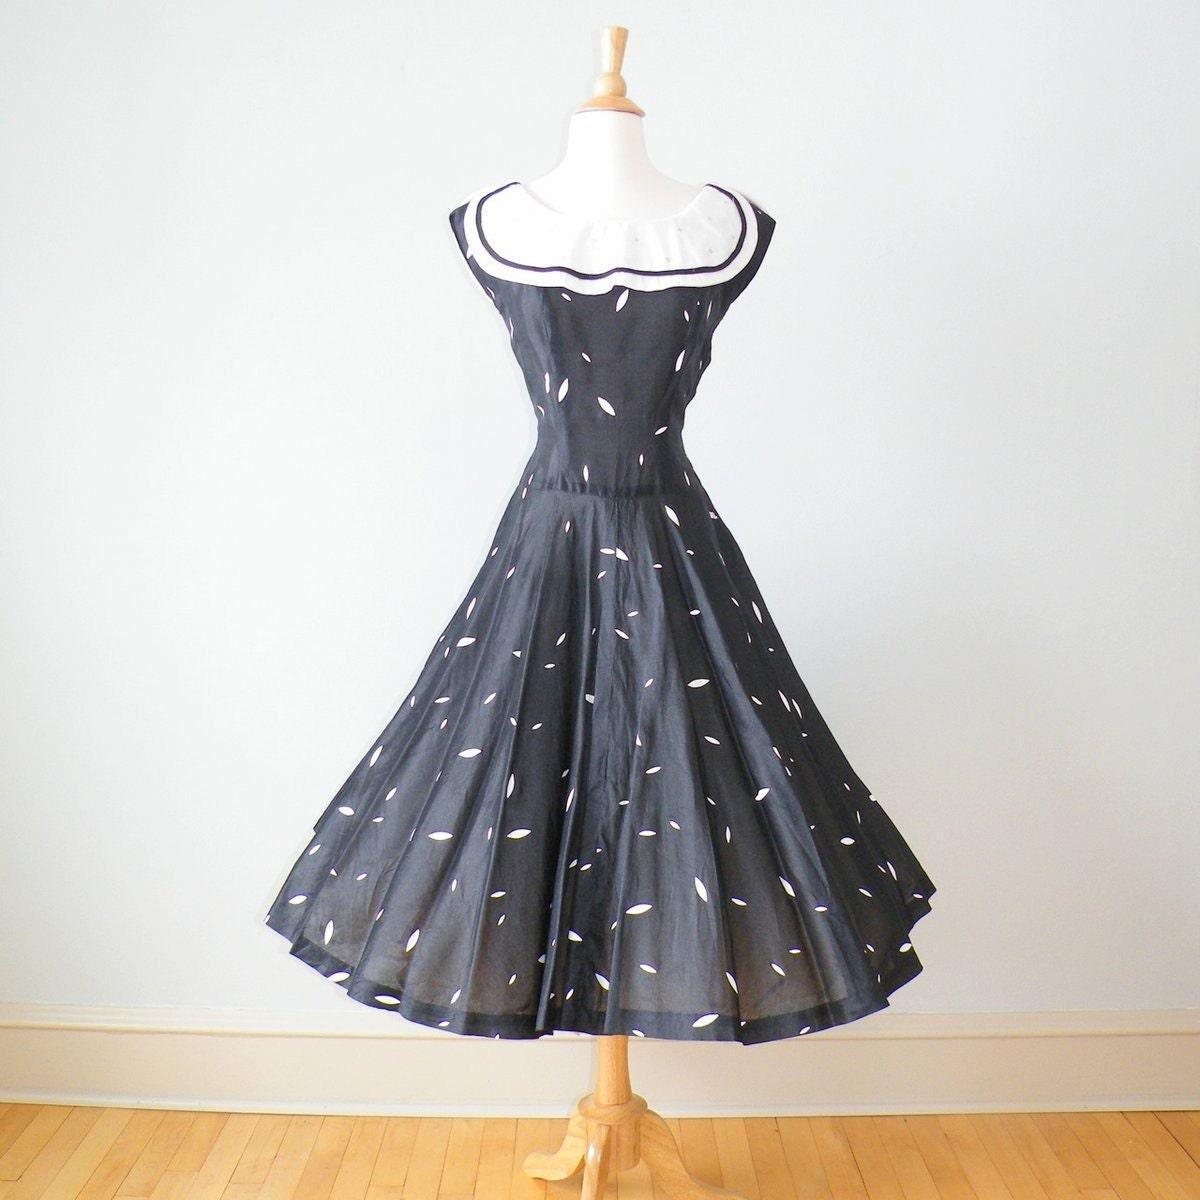 Thursday Finds - Vintage Dress Edition!